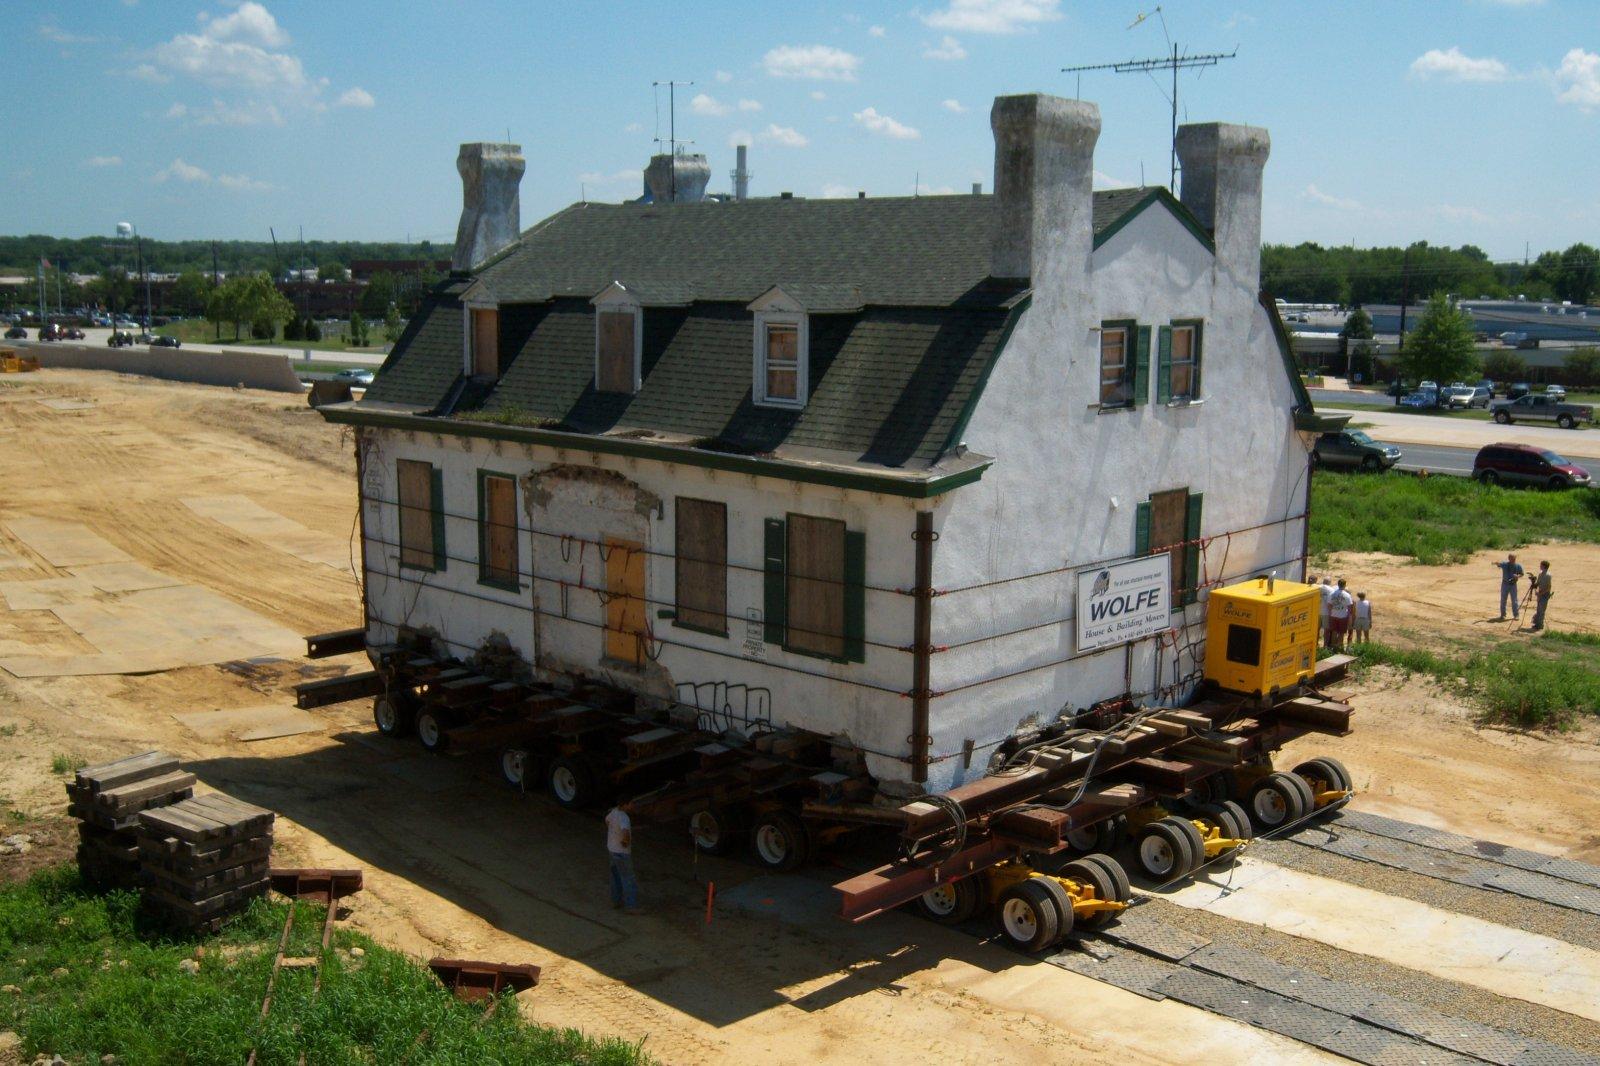 hydrolic_dollies_relocate_house_in_newark_delaware